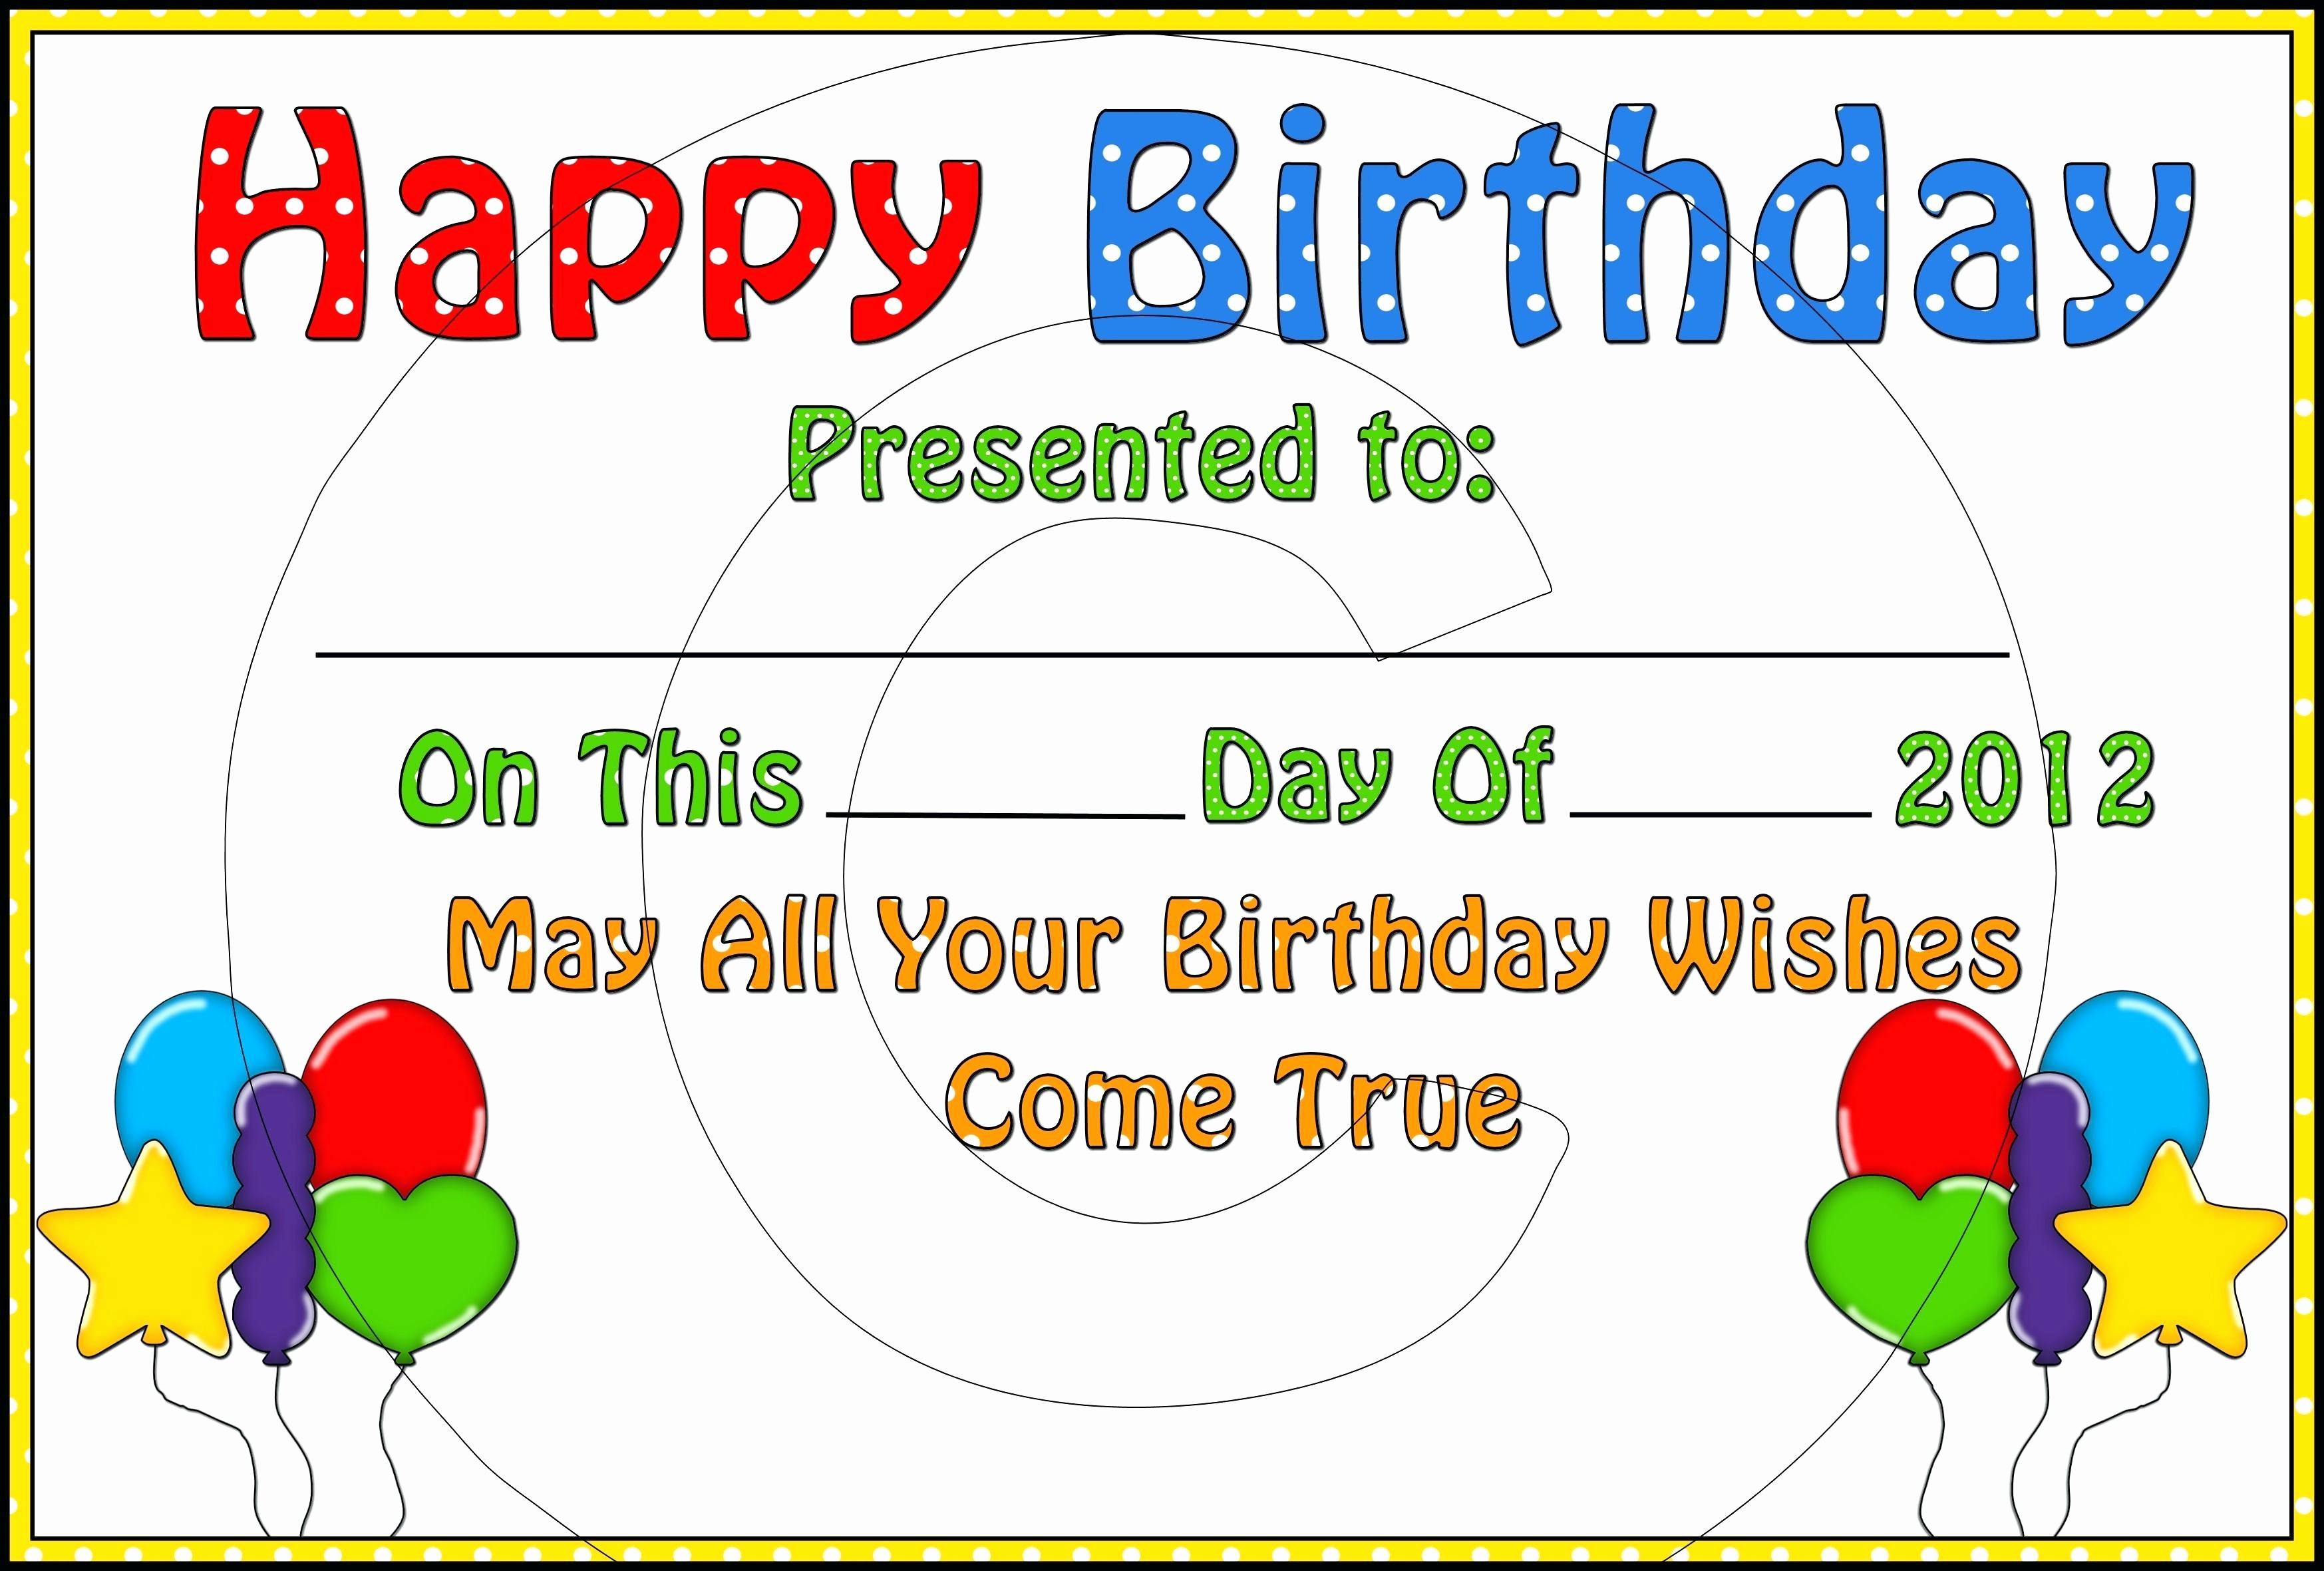 Happy Birthday Certificate Free Printable Luxury Template Happy Birthday Certificate Template